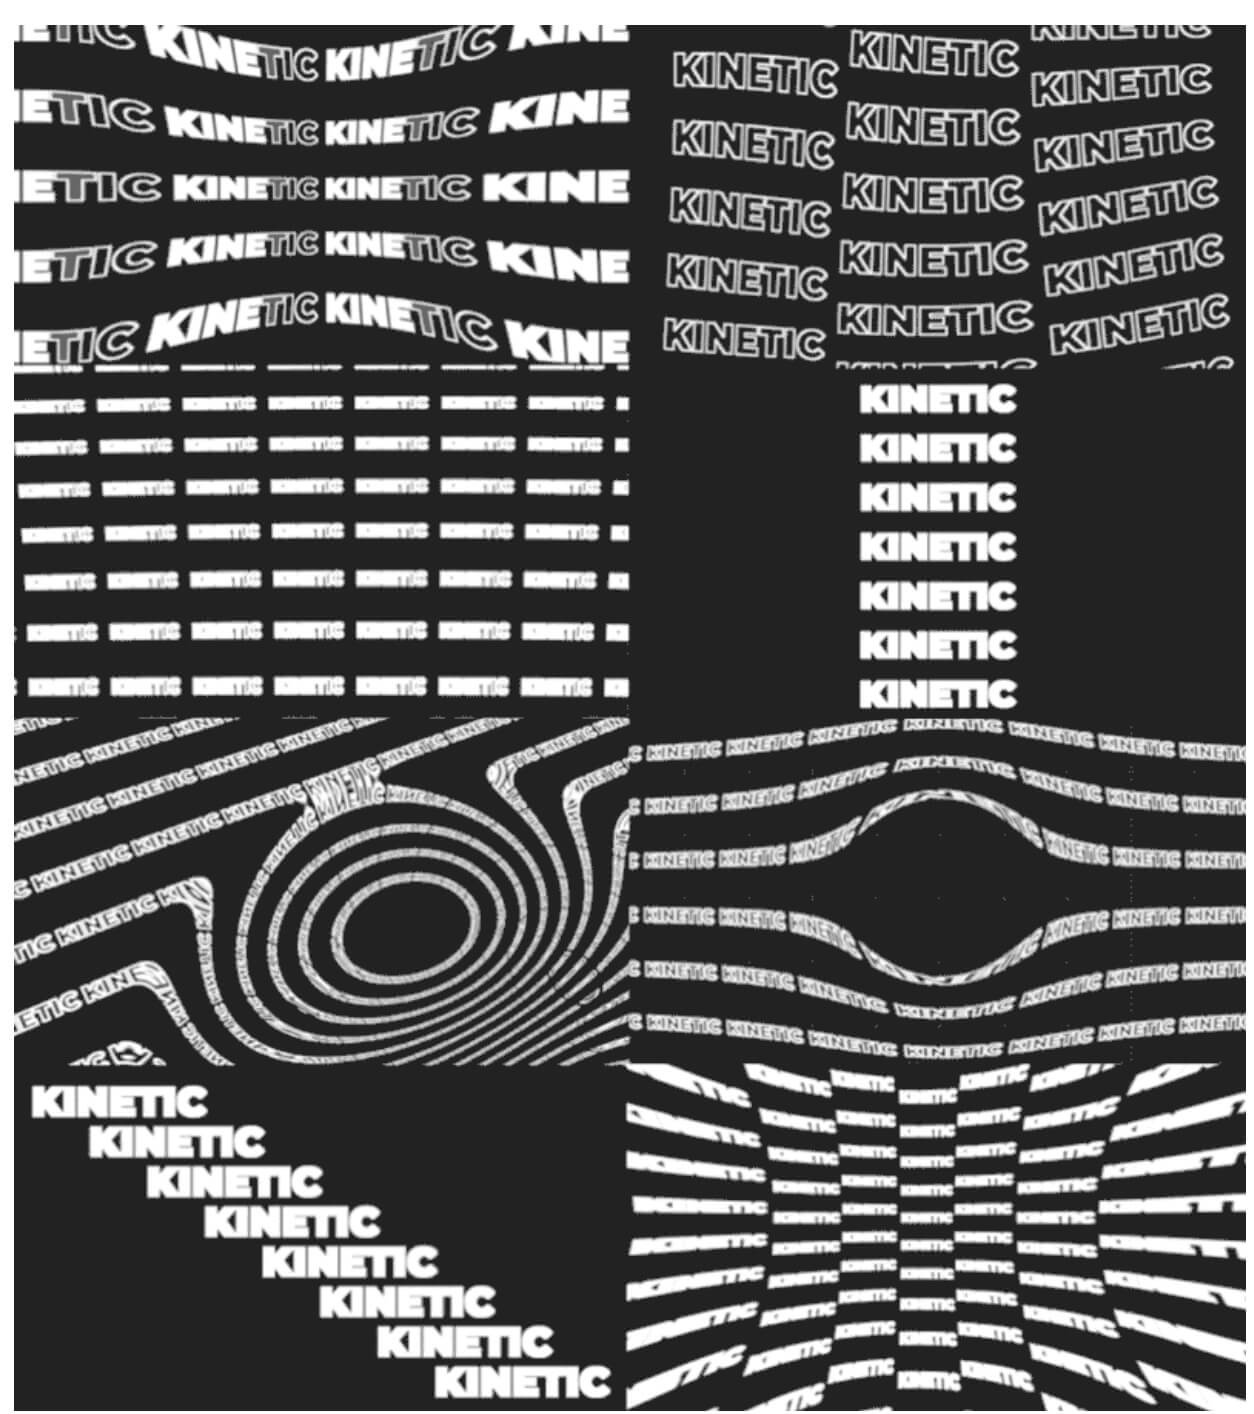 Fcpx插件 1000个拉伸旋转缩放图形水墨光效VHS故障分割转场特效调色标题插件V6